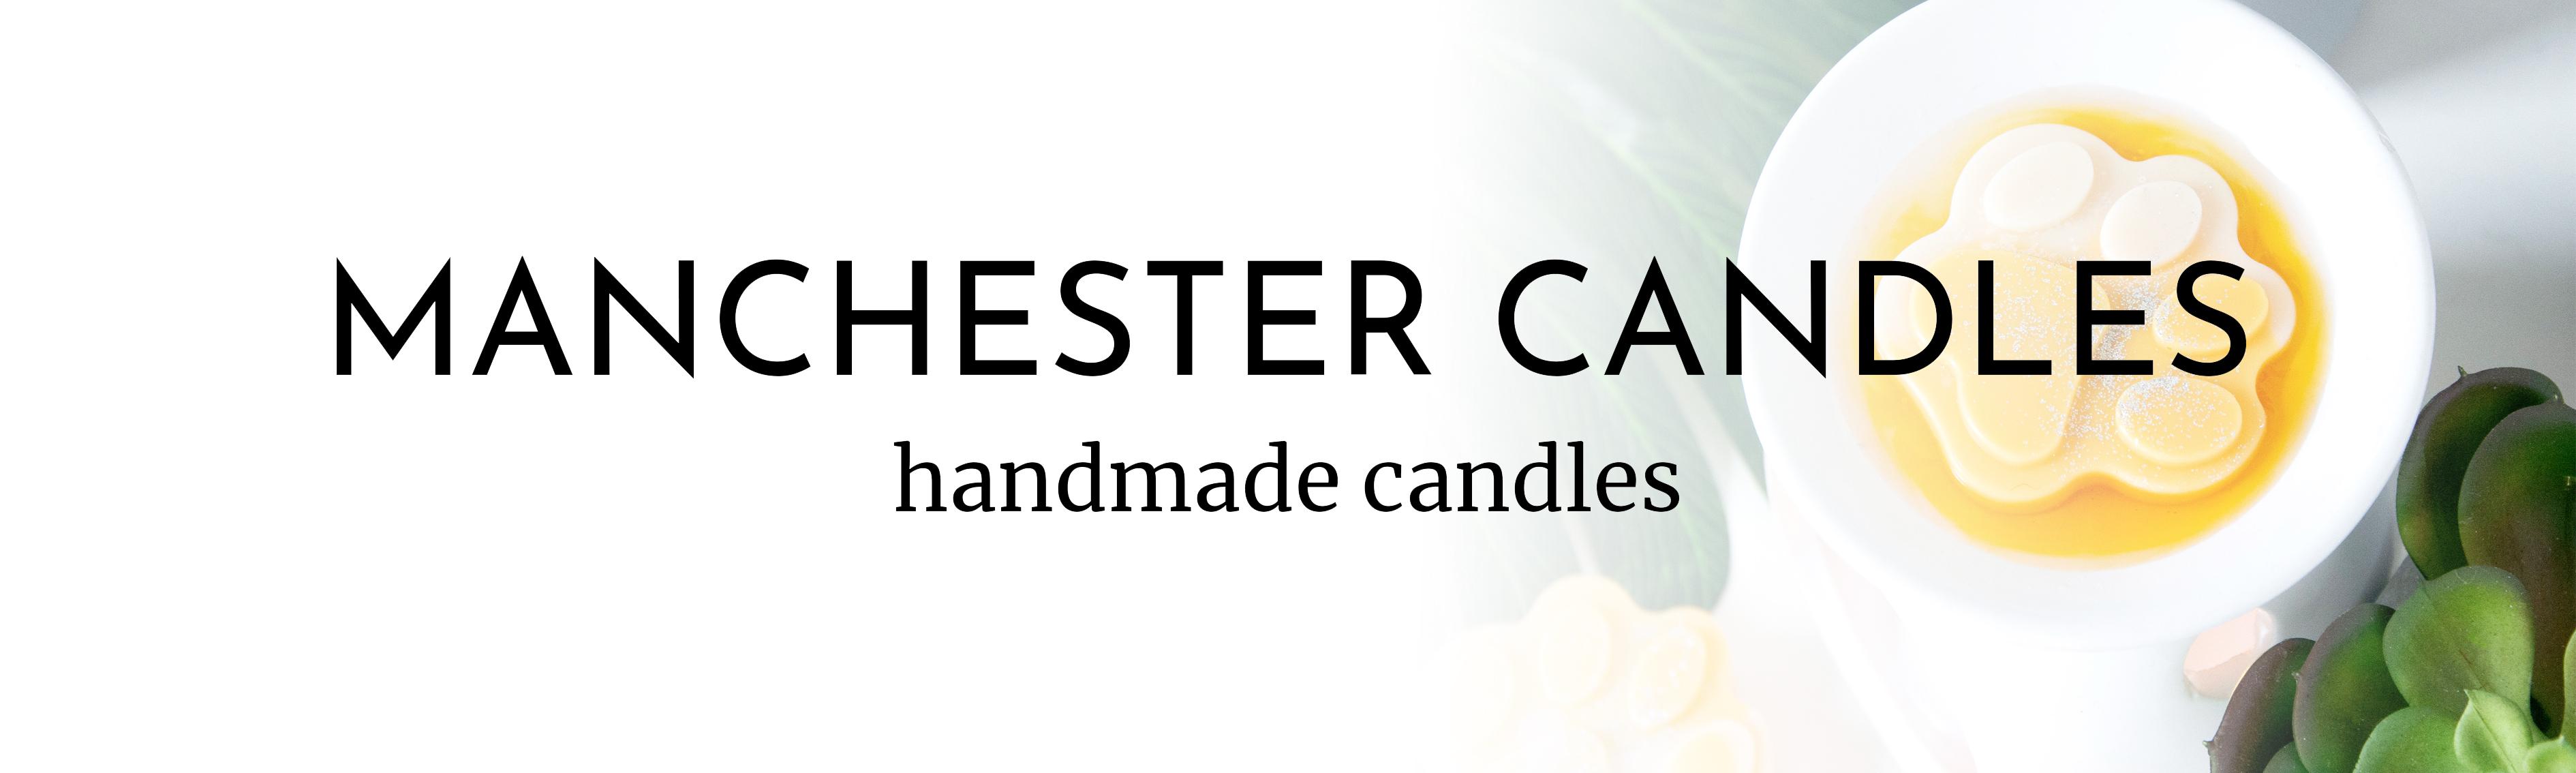 Manchester Candles